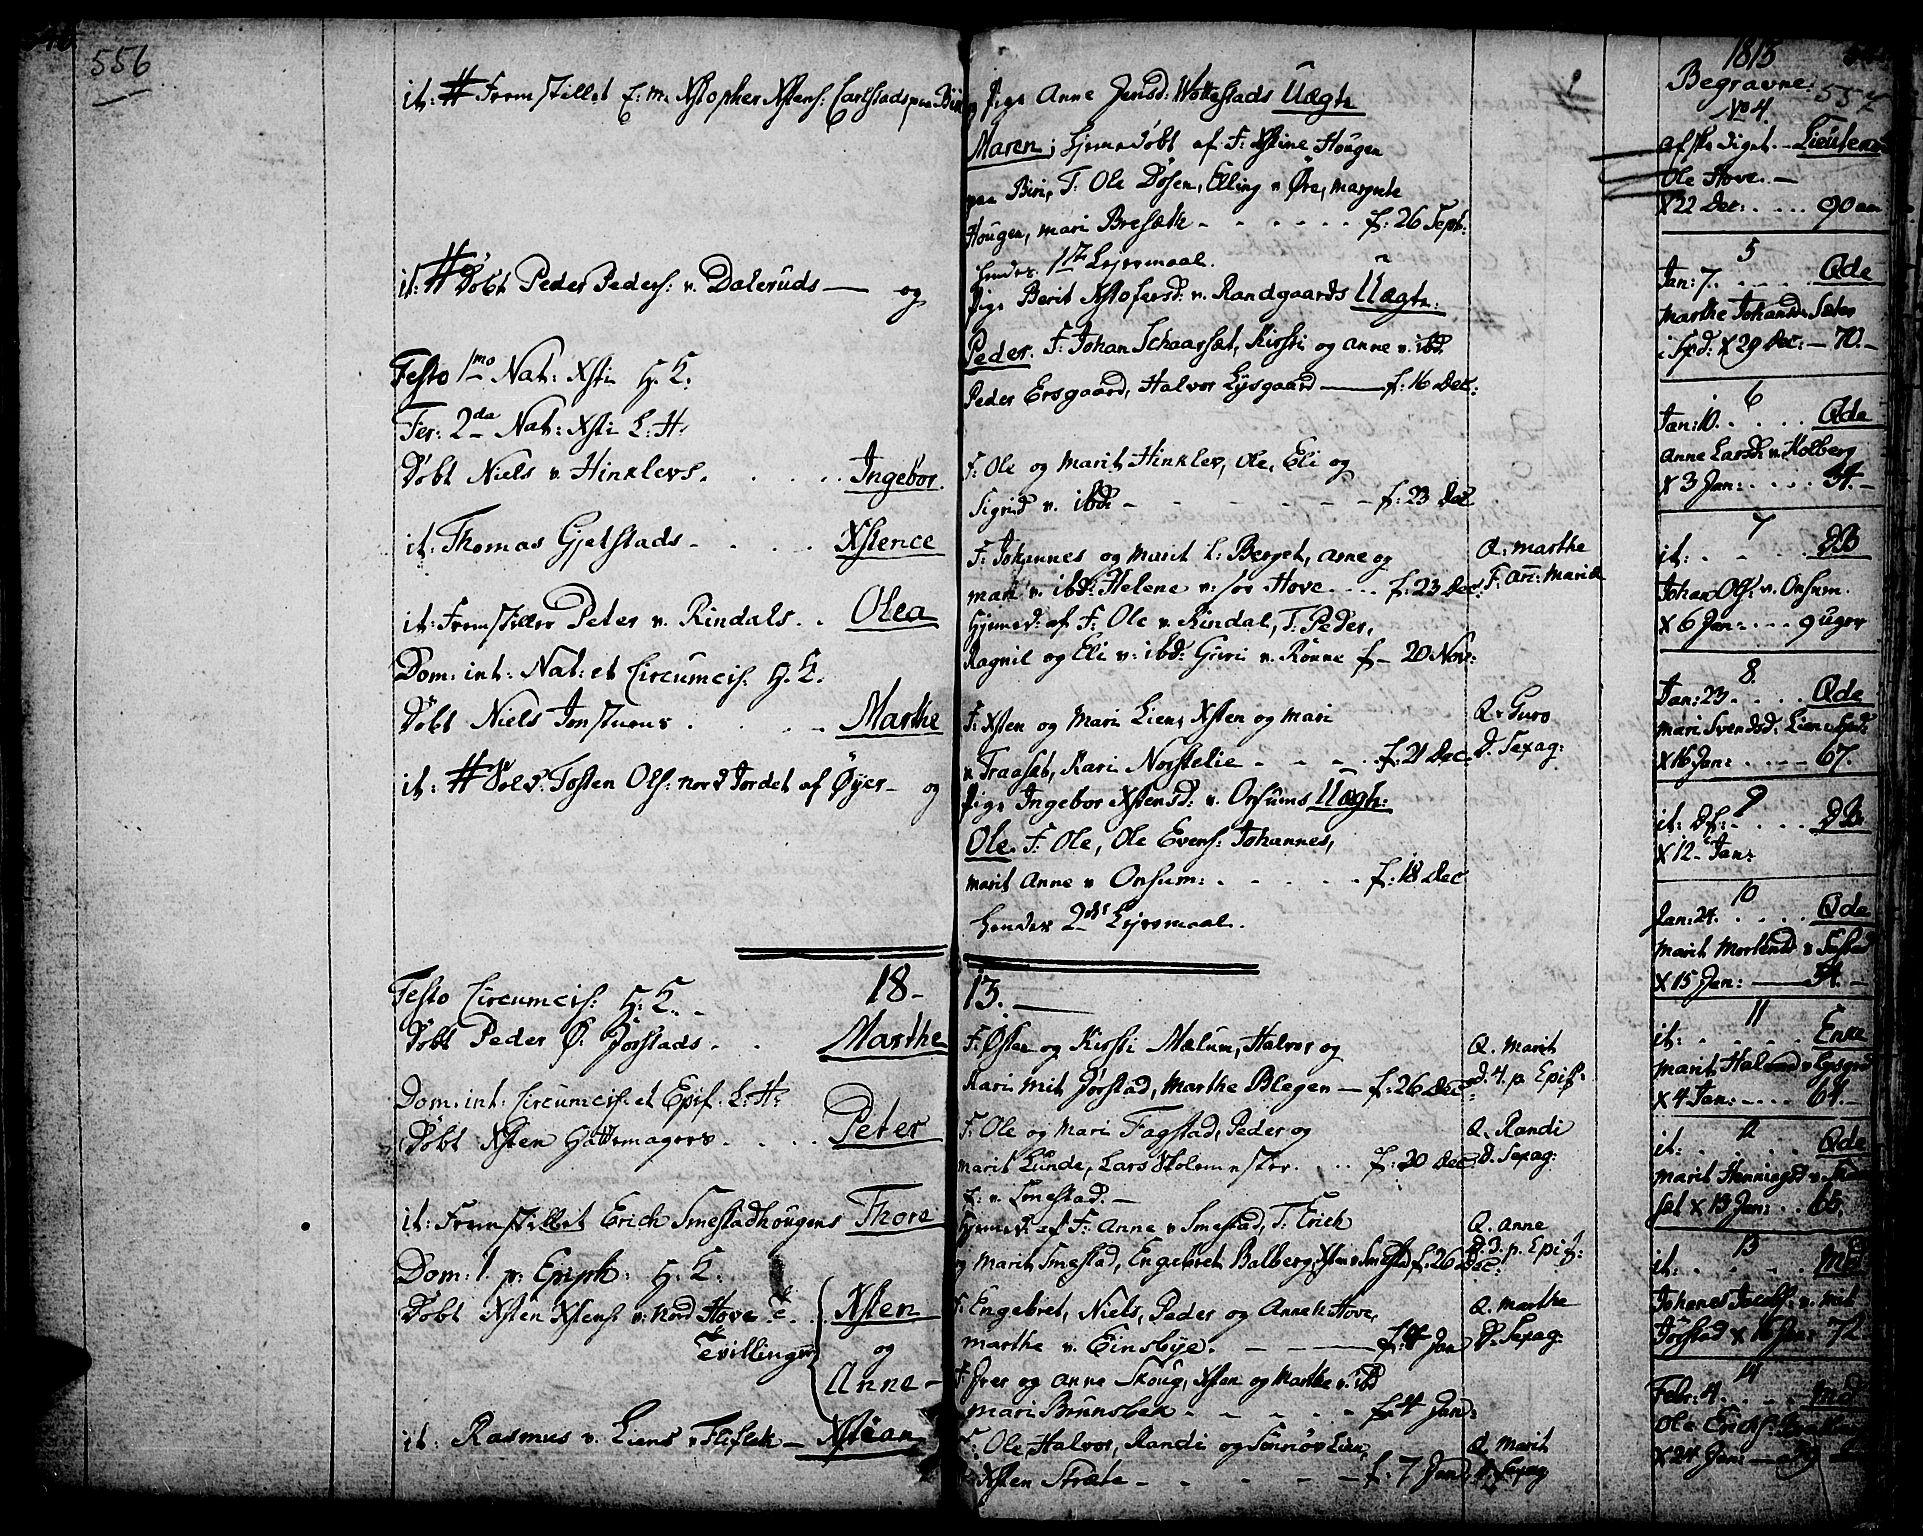 SAH, Fåberg prestekontor, Ministerialbok nr. 2, 1775-1818, s. 556-557